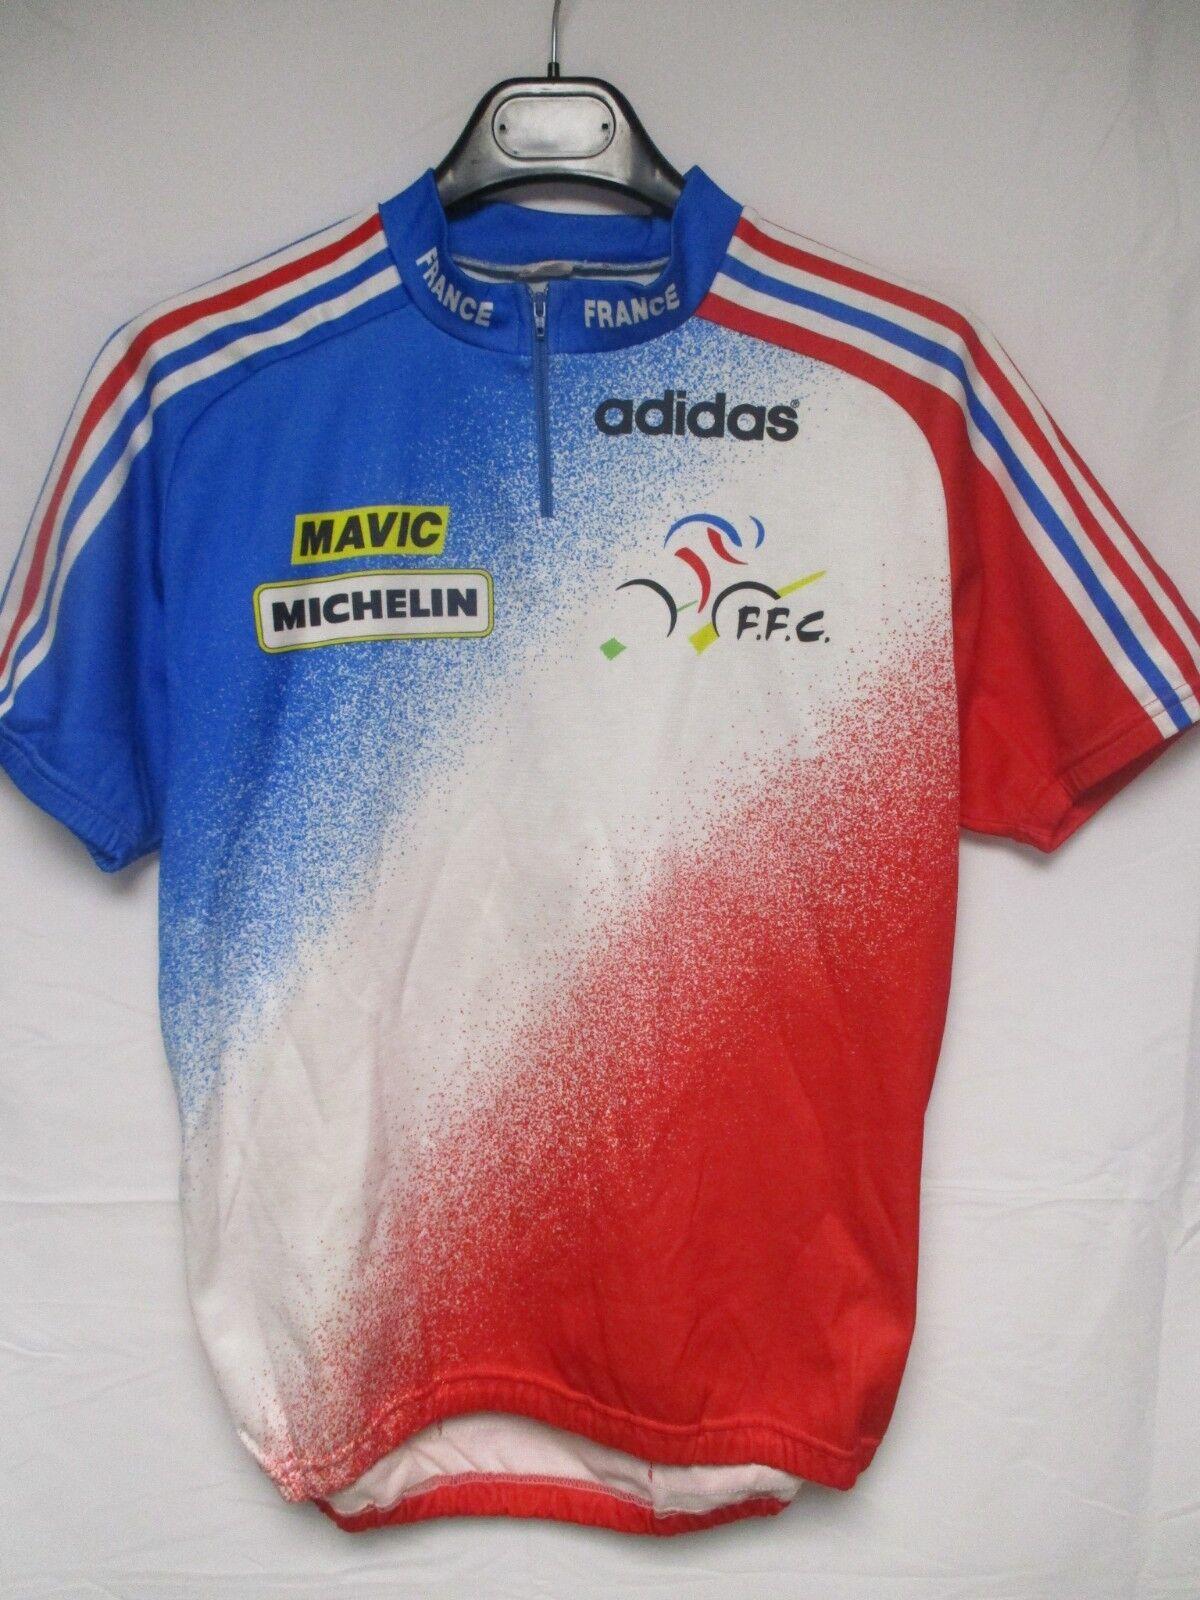 Maillot cycliste Equipe de FRANCE F.F.C ADIDAS shirt Mavic Michelin Noret 5 XL